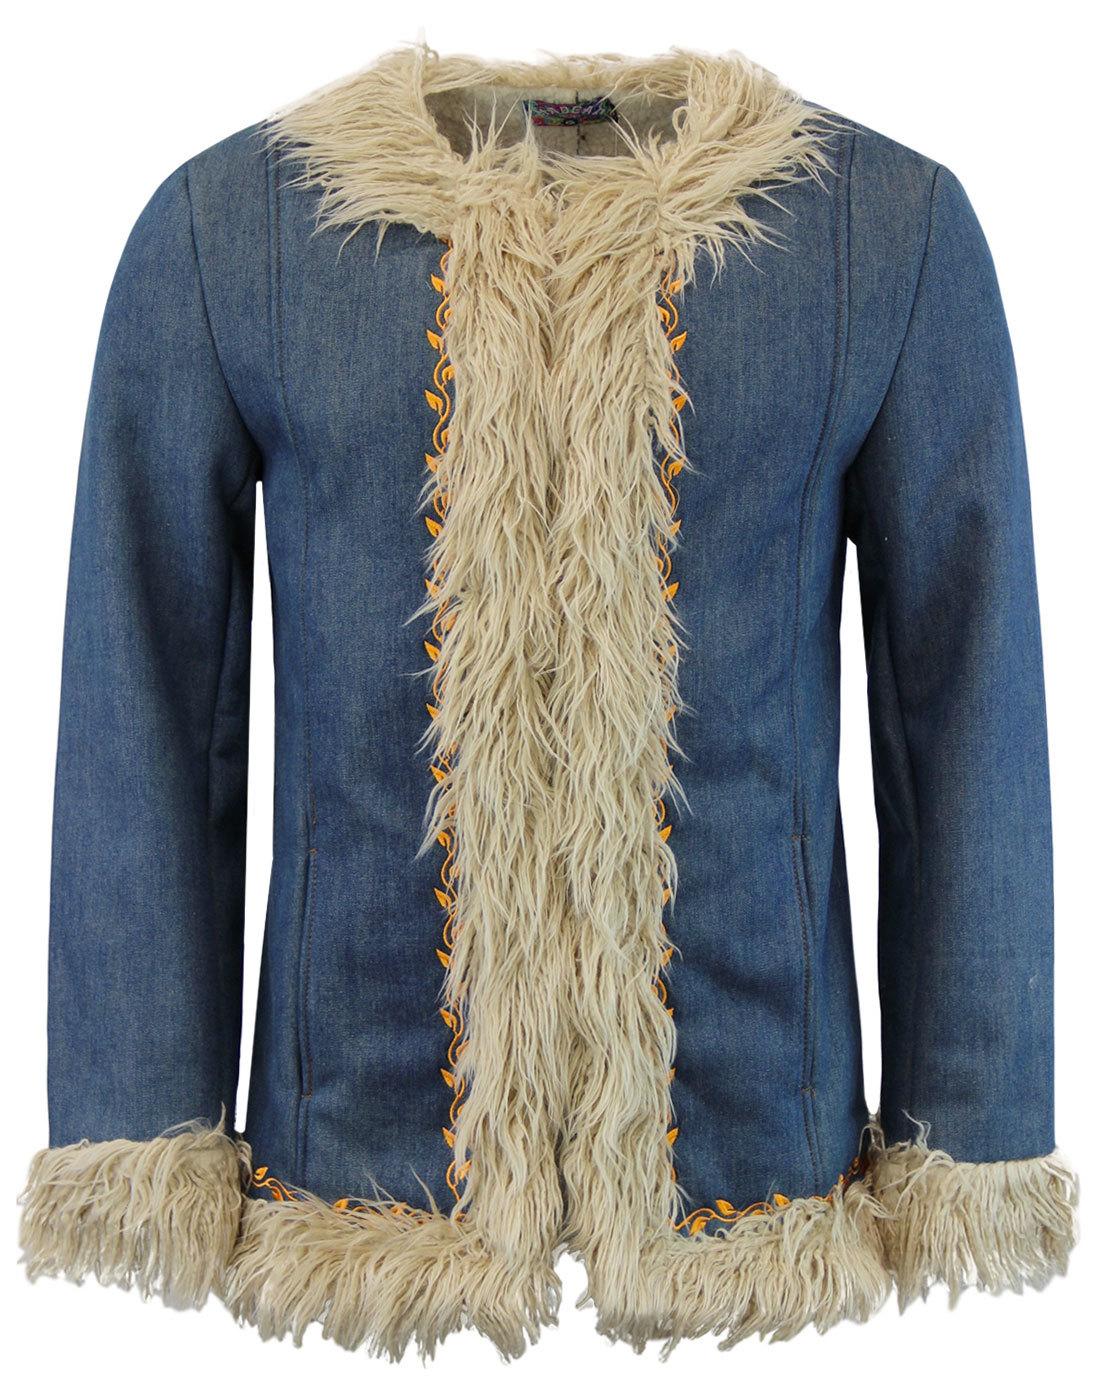 madcap england walrus retro 60s denim afghan coat